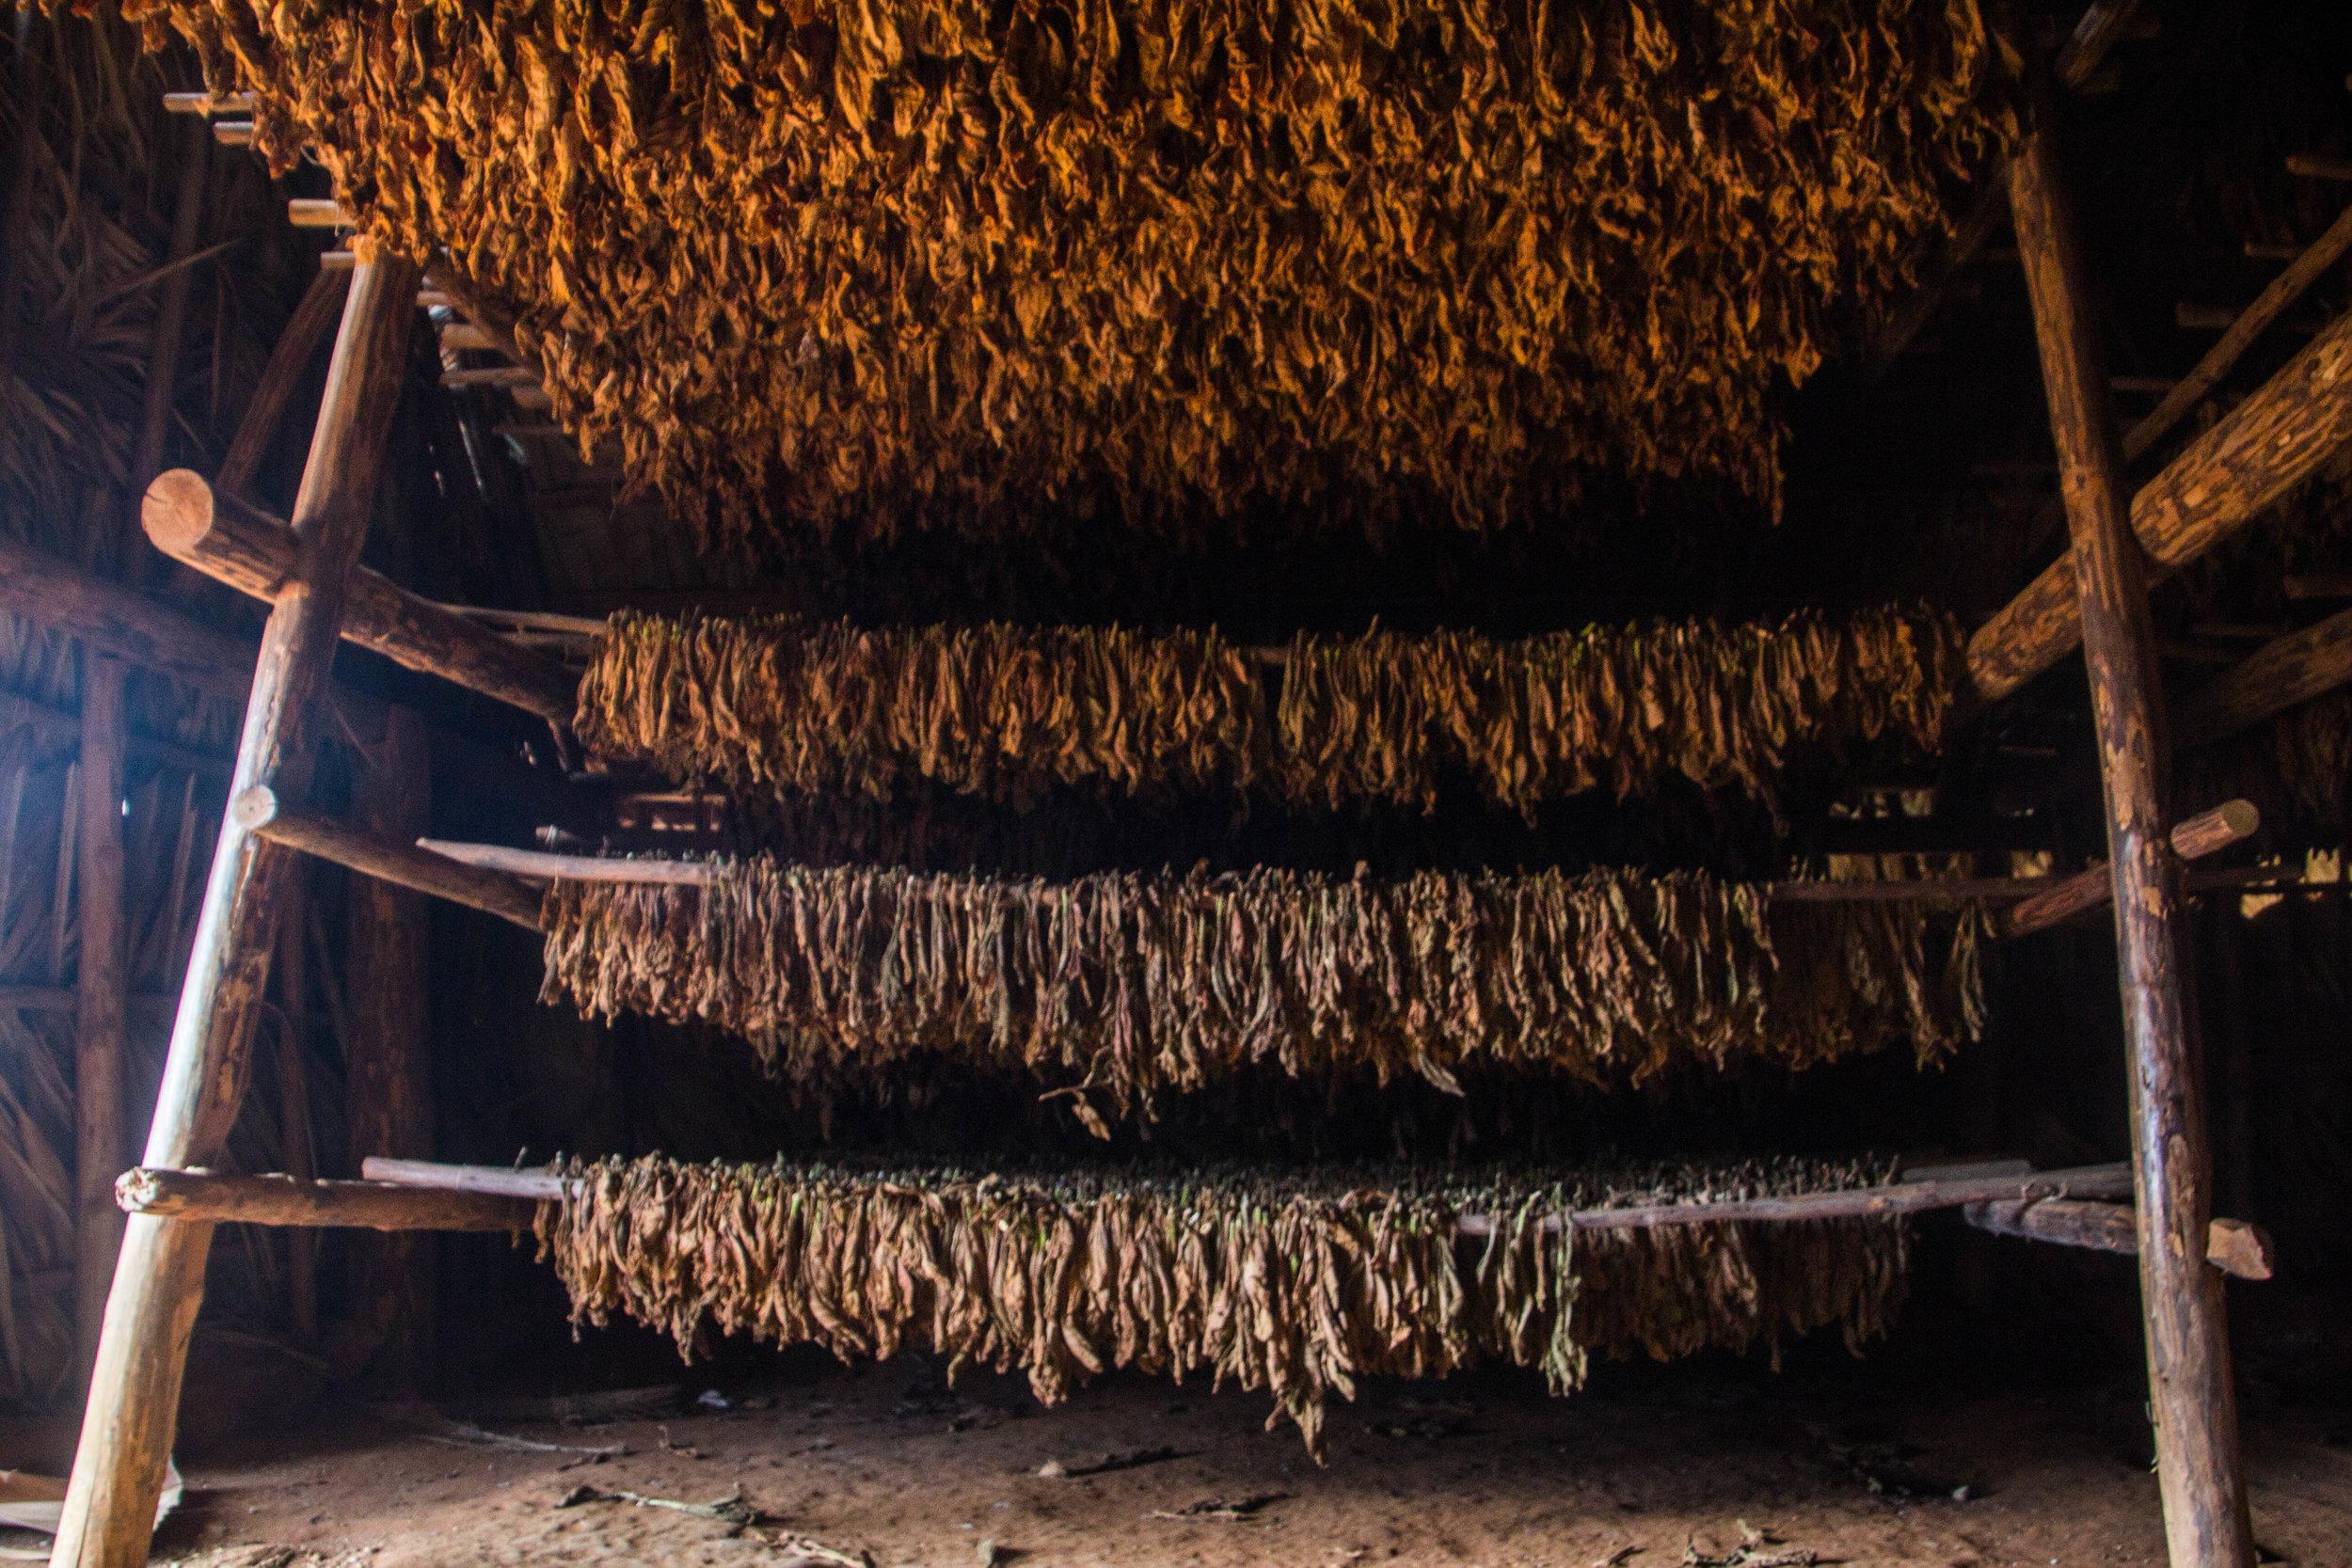 inside tobacco houses viñales cuba-1-4.jpg